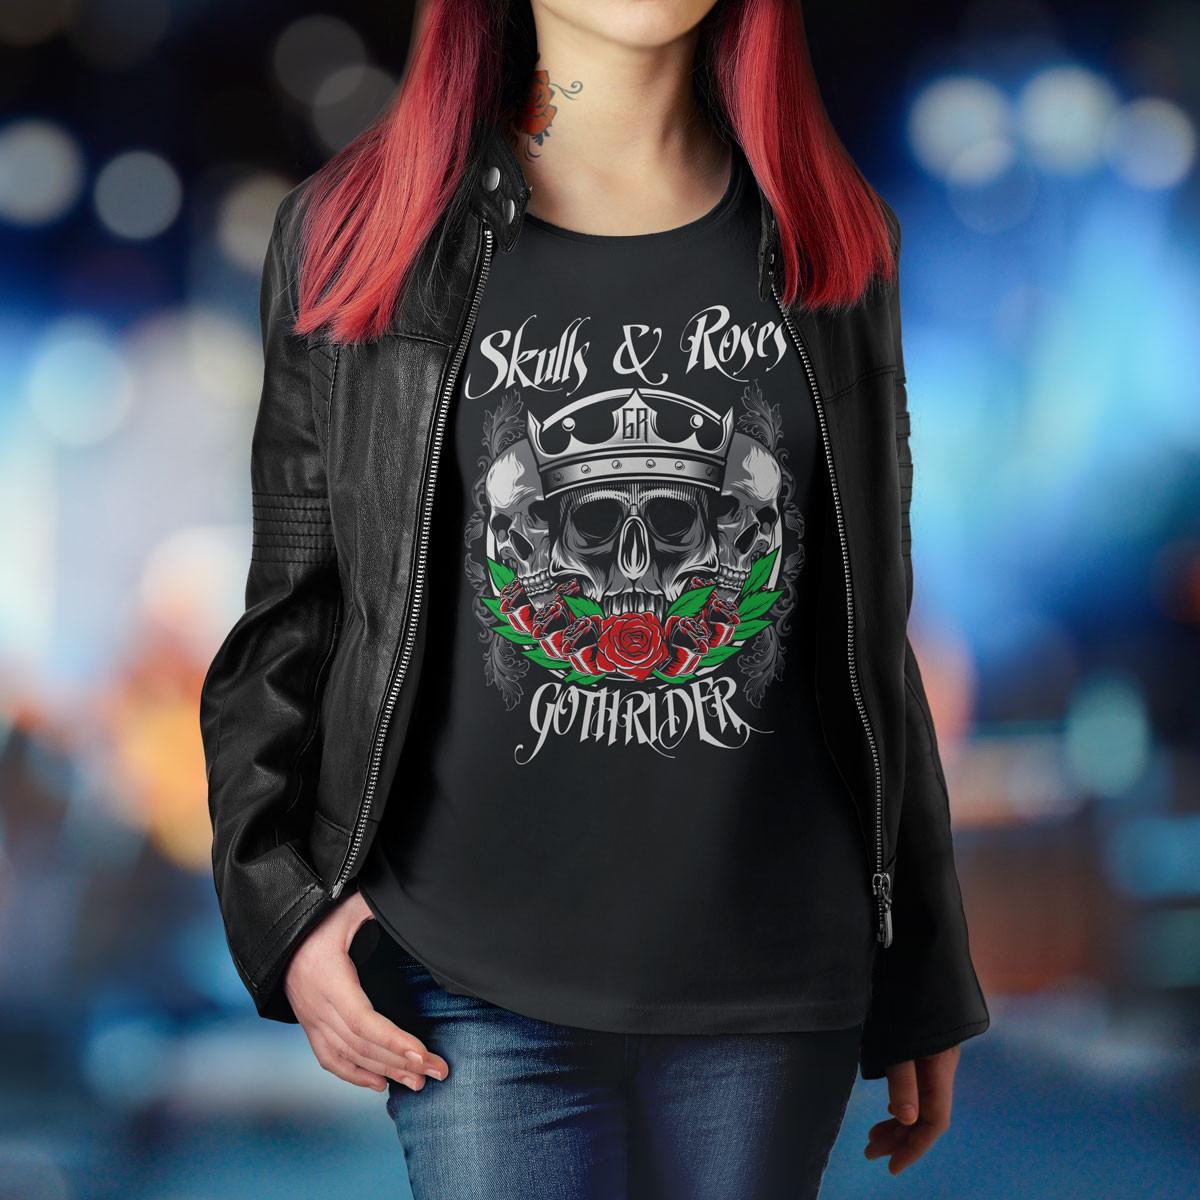 skulls and roses biker fashion women's tee